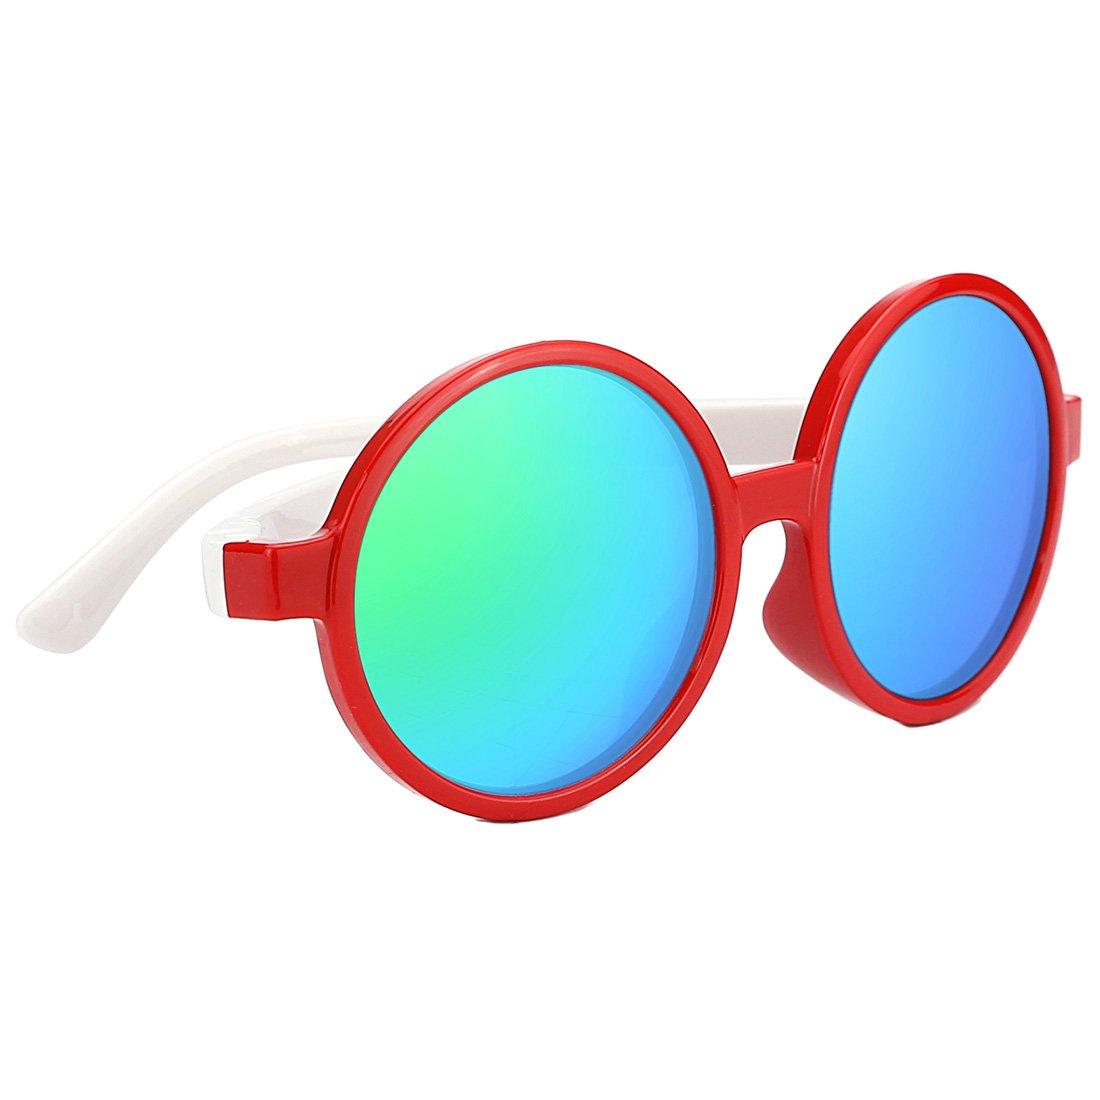 TIJN Kids Toddler Flexiable Rubber Polarized Round Sunglasses for Girl Boys (red & white)